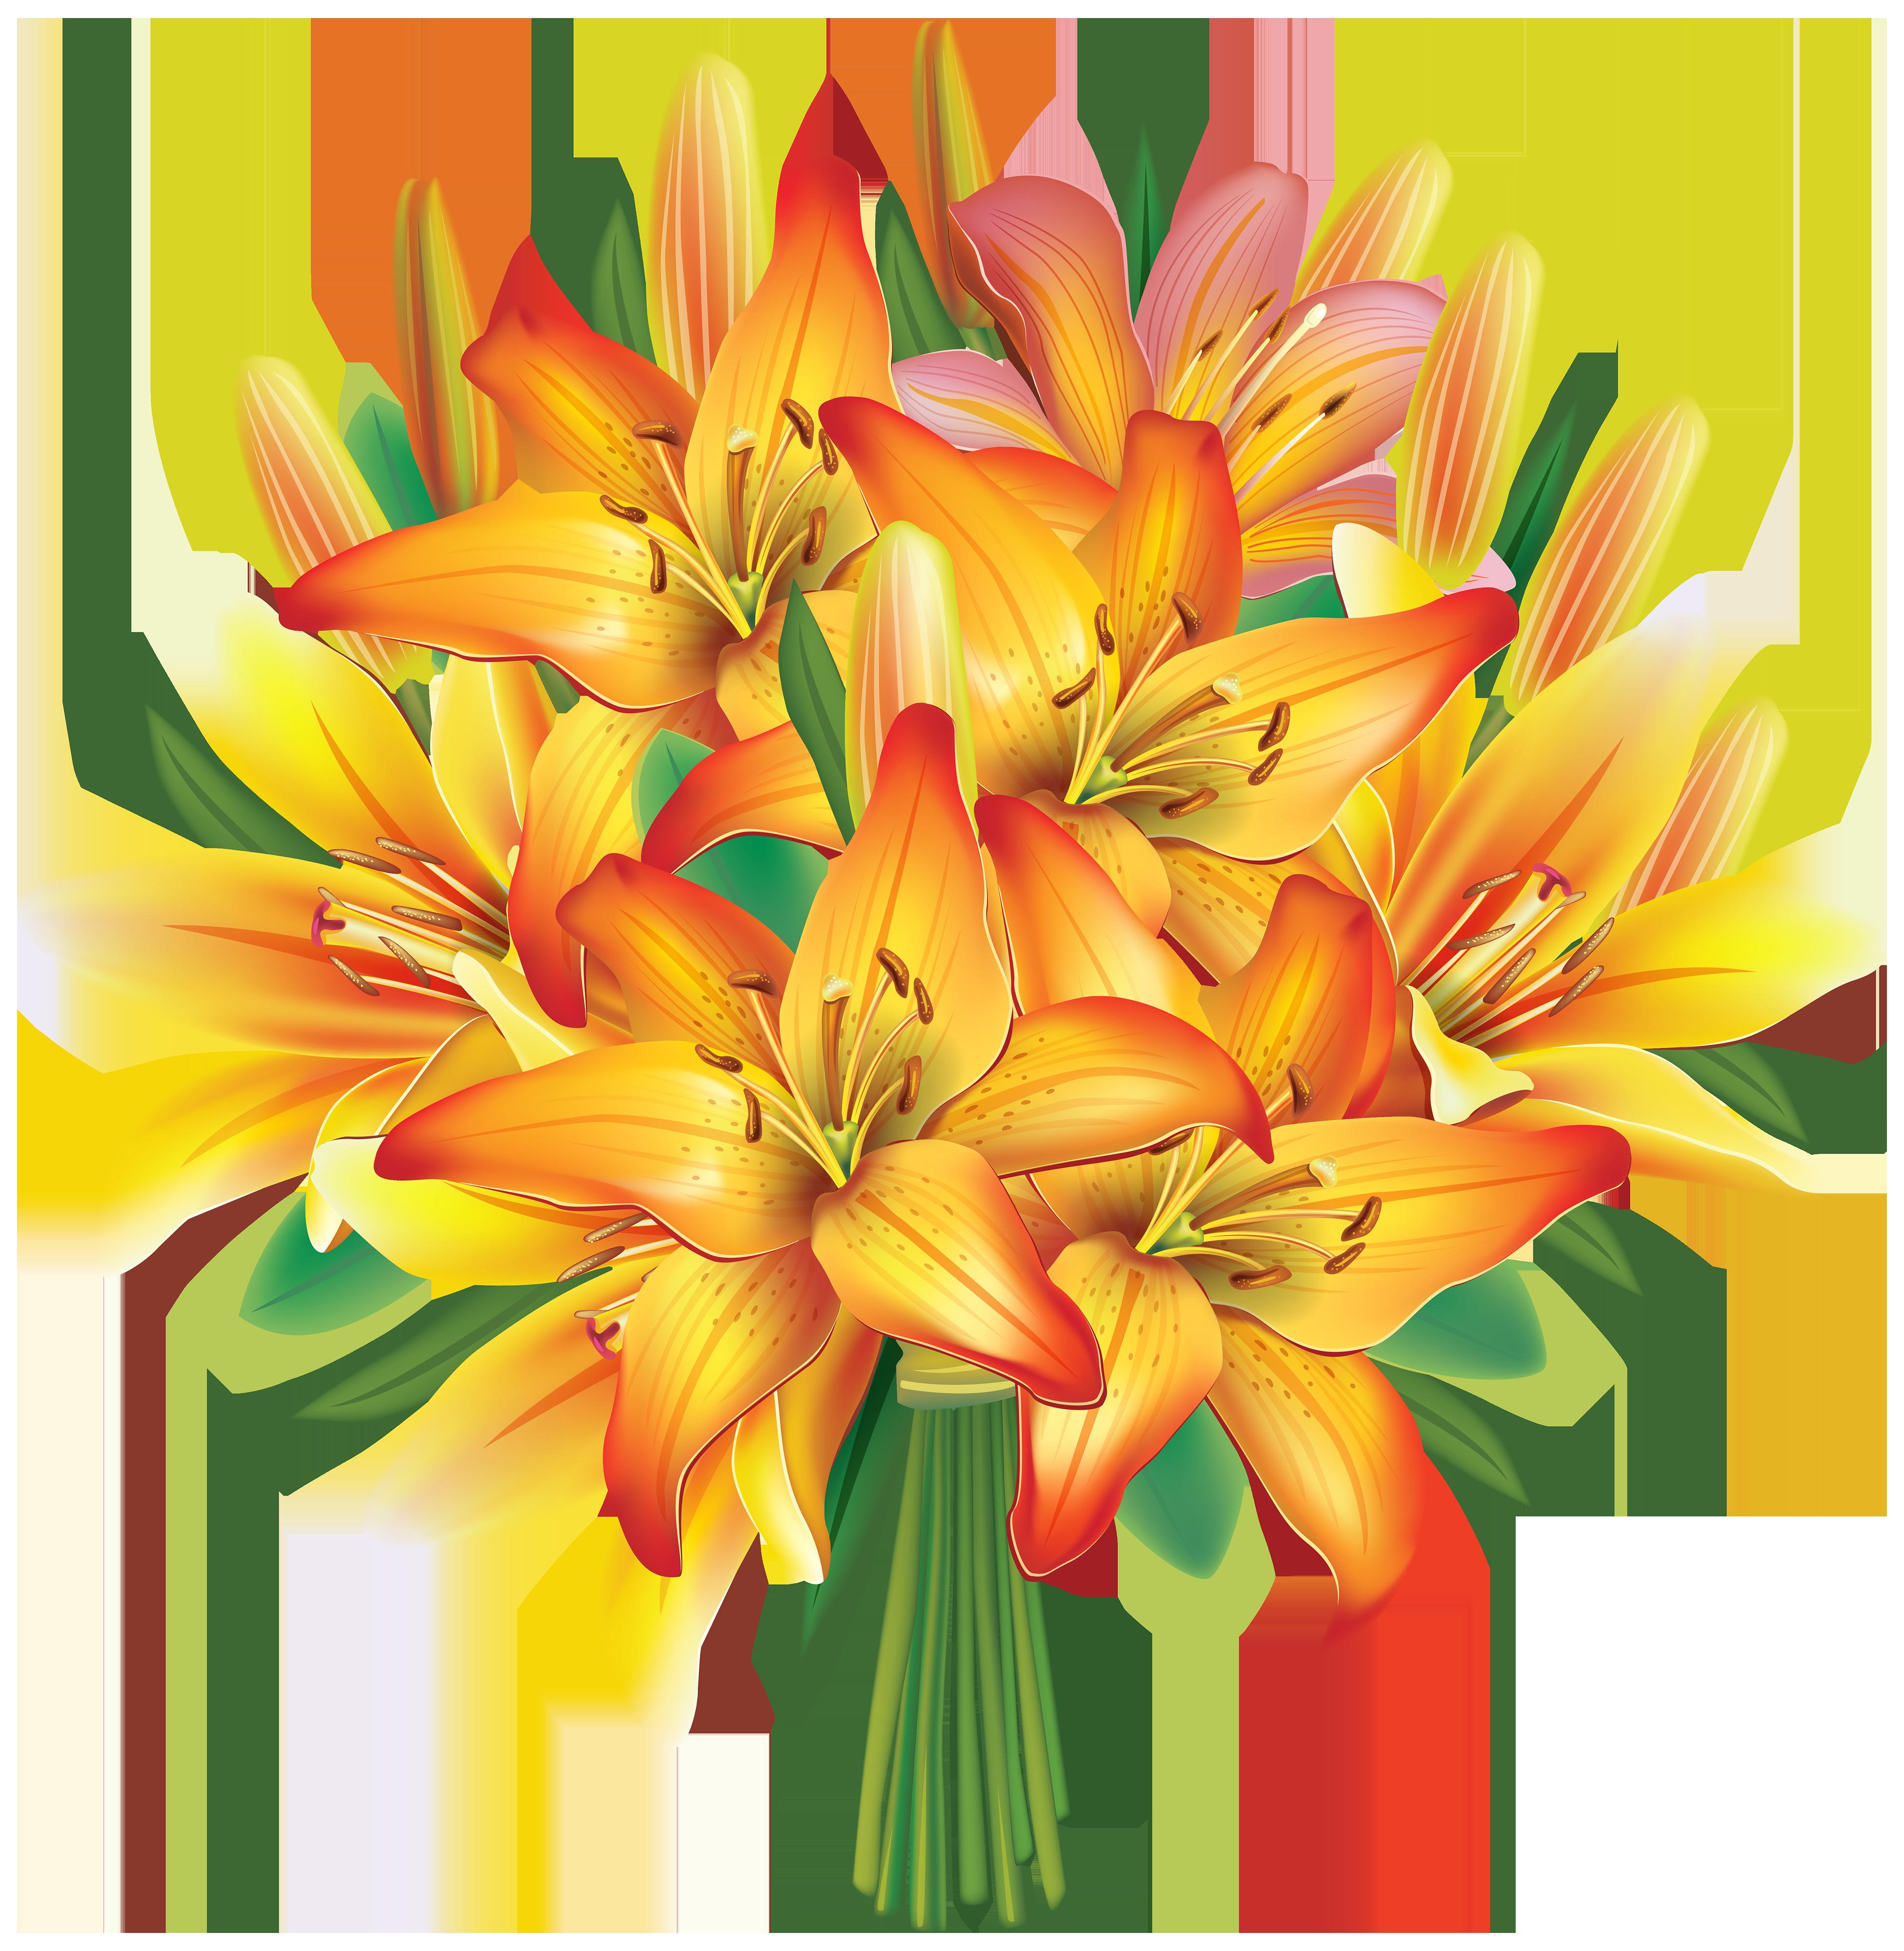 3903x4000 Yellow Lilies Flowers Bouquet Png Clipart Imageu200b Gallery